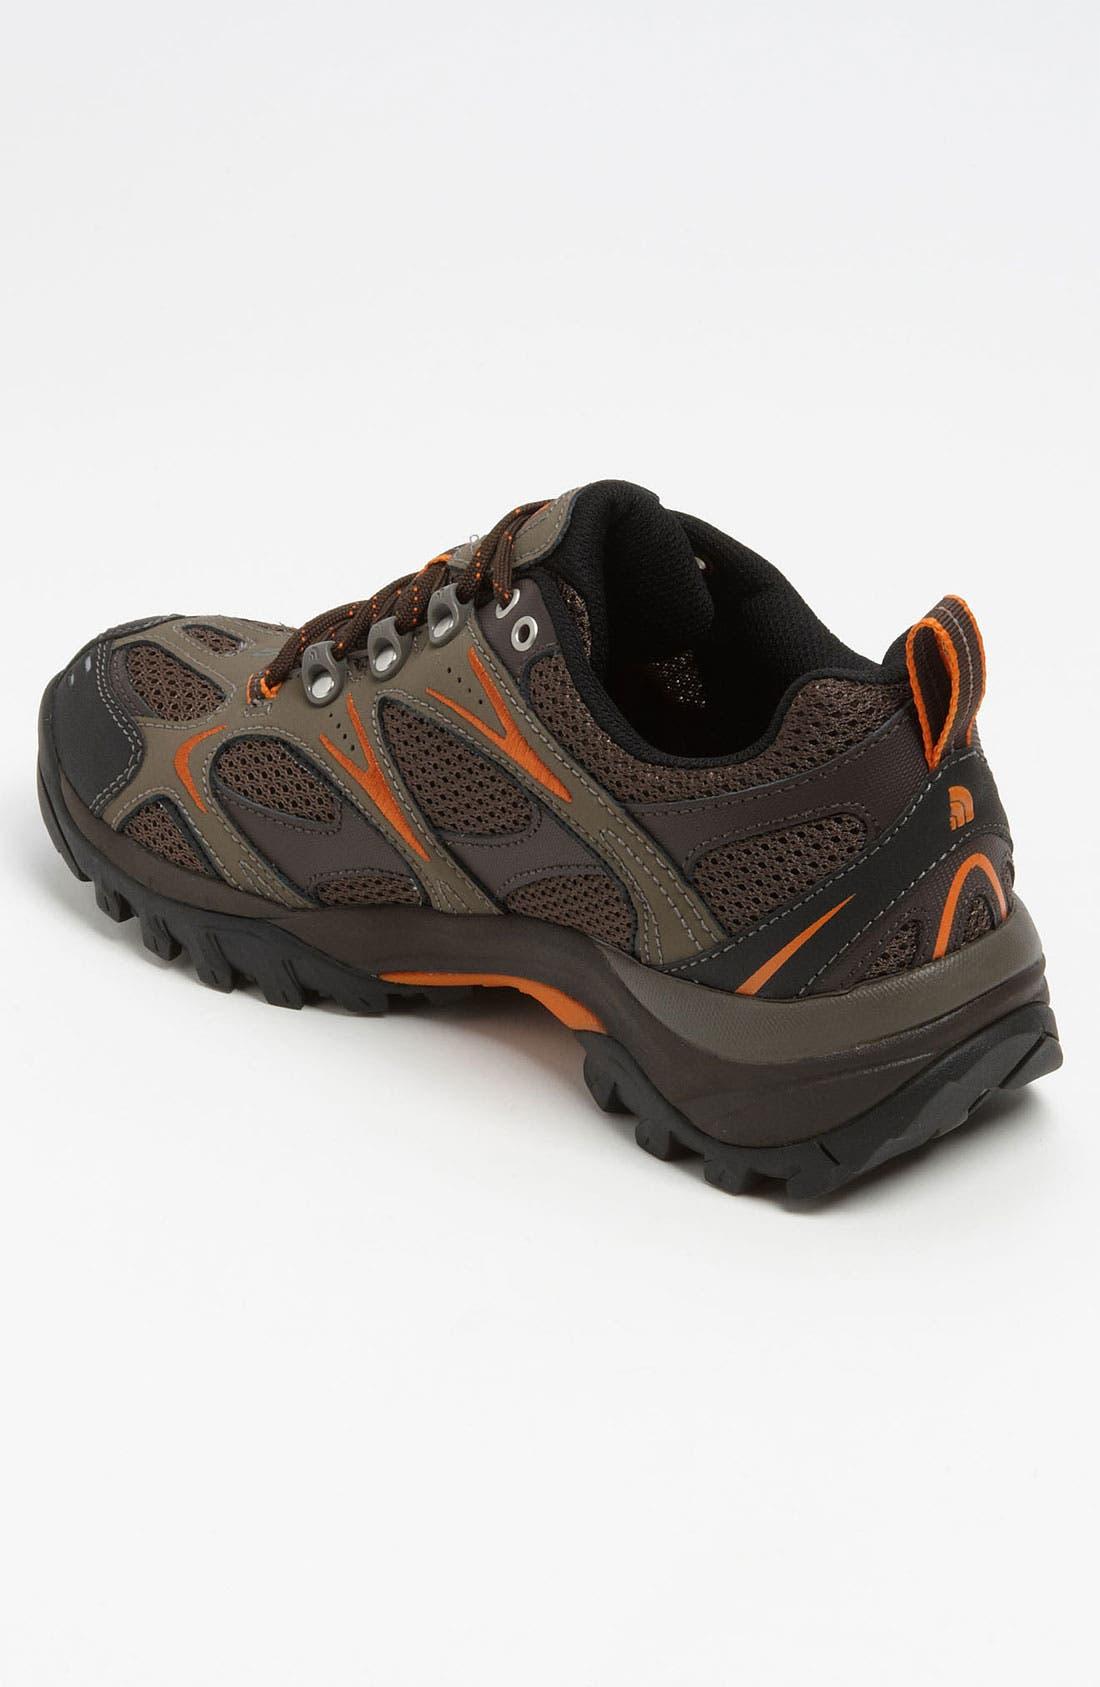 Alternate Image 2  - The North Face 'Hedgehog III' Hiking Shoe (Men)